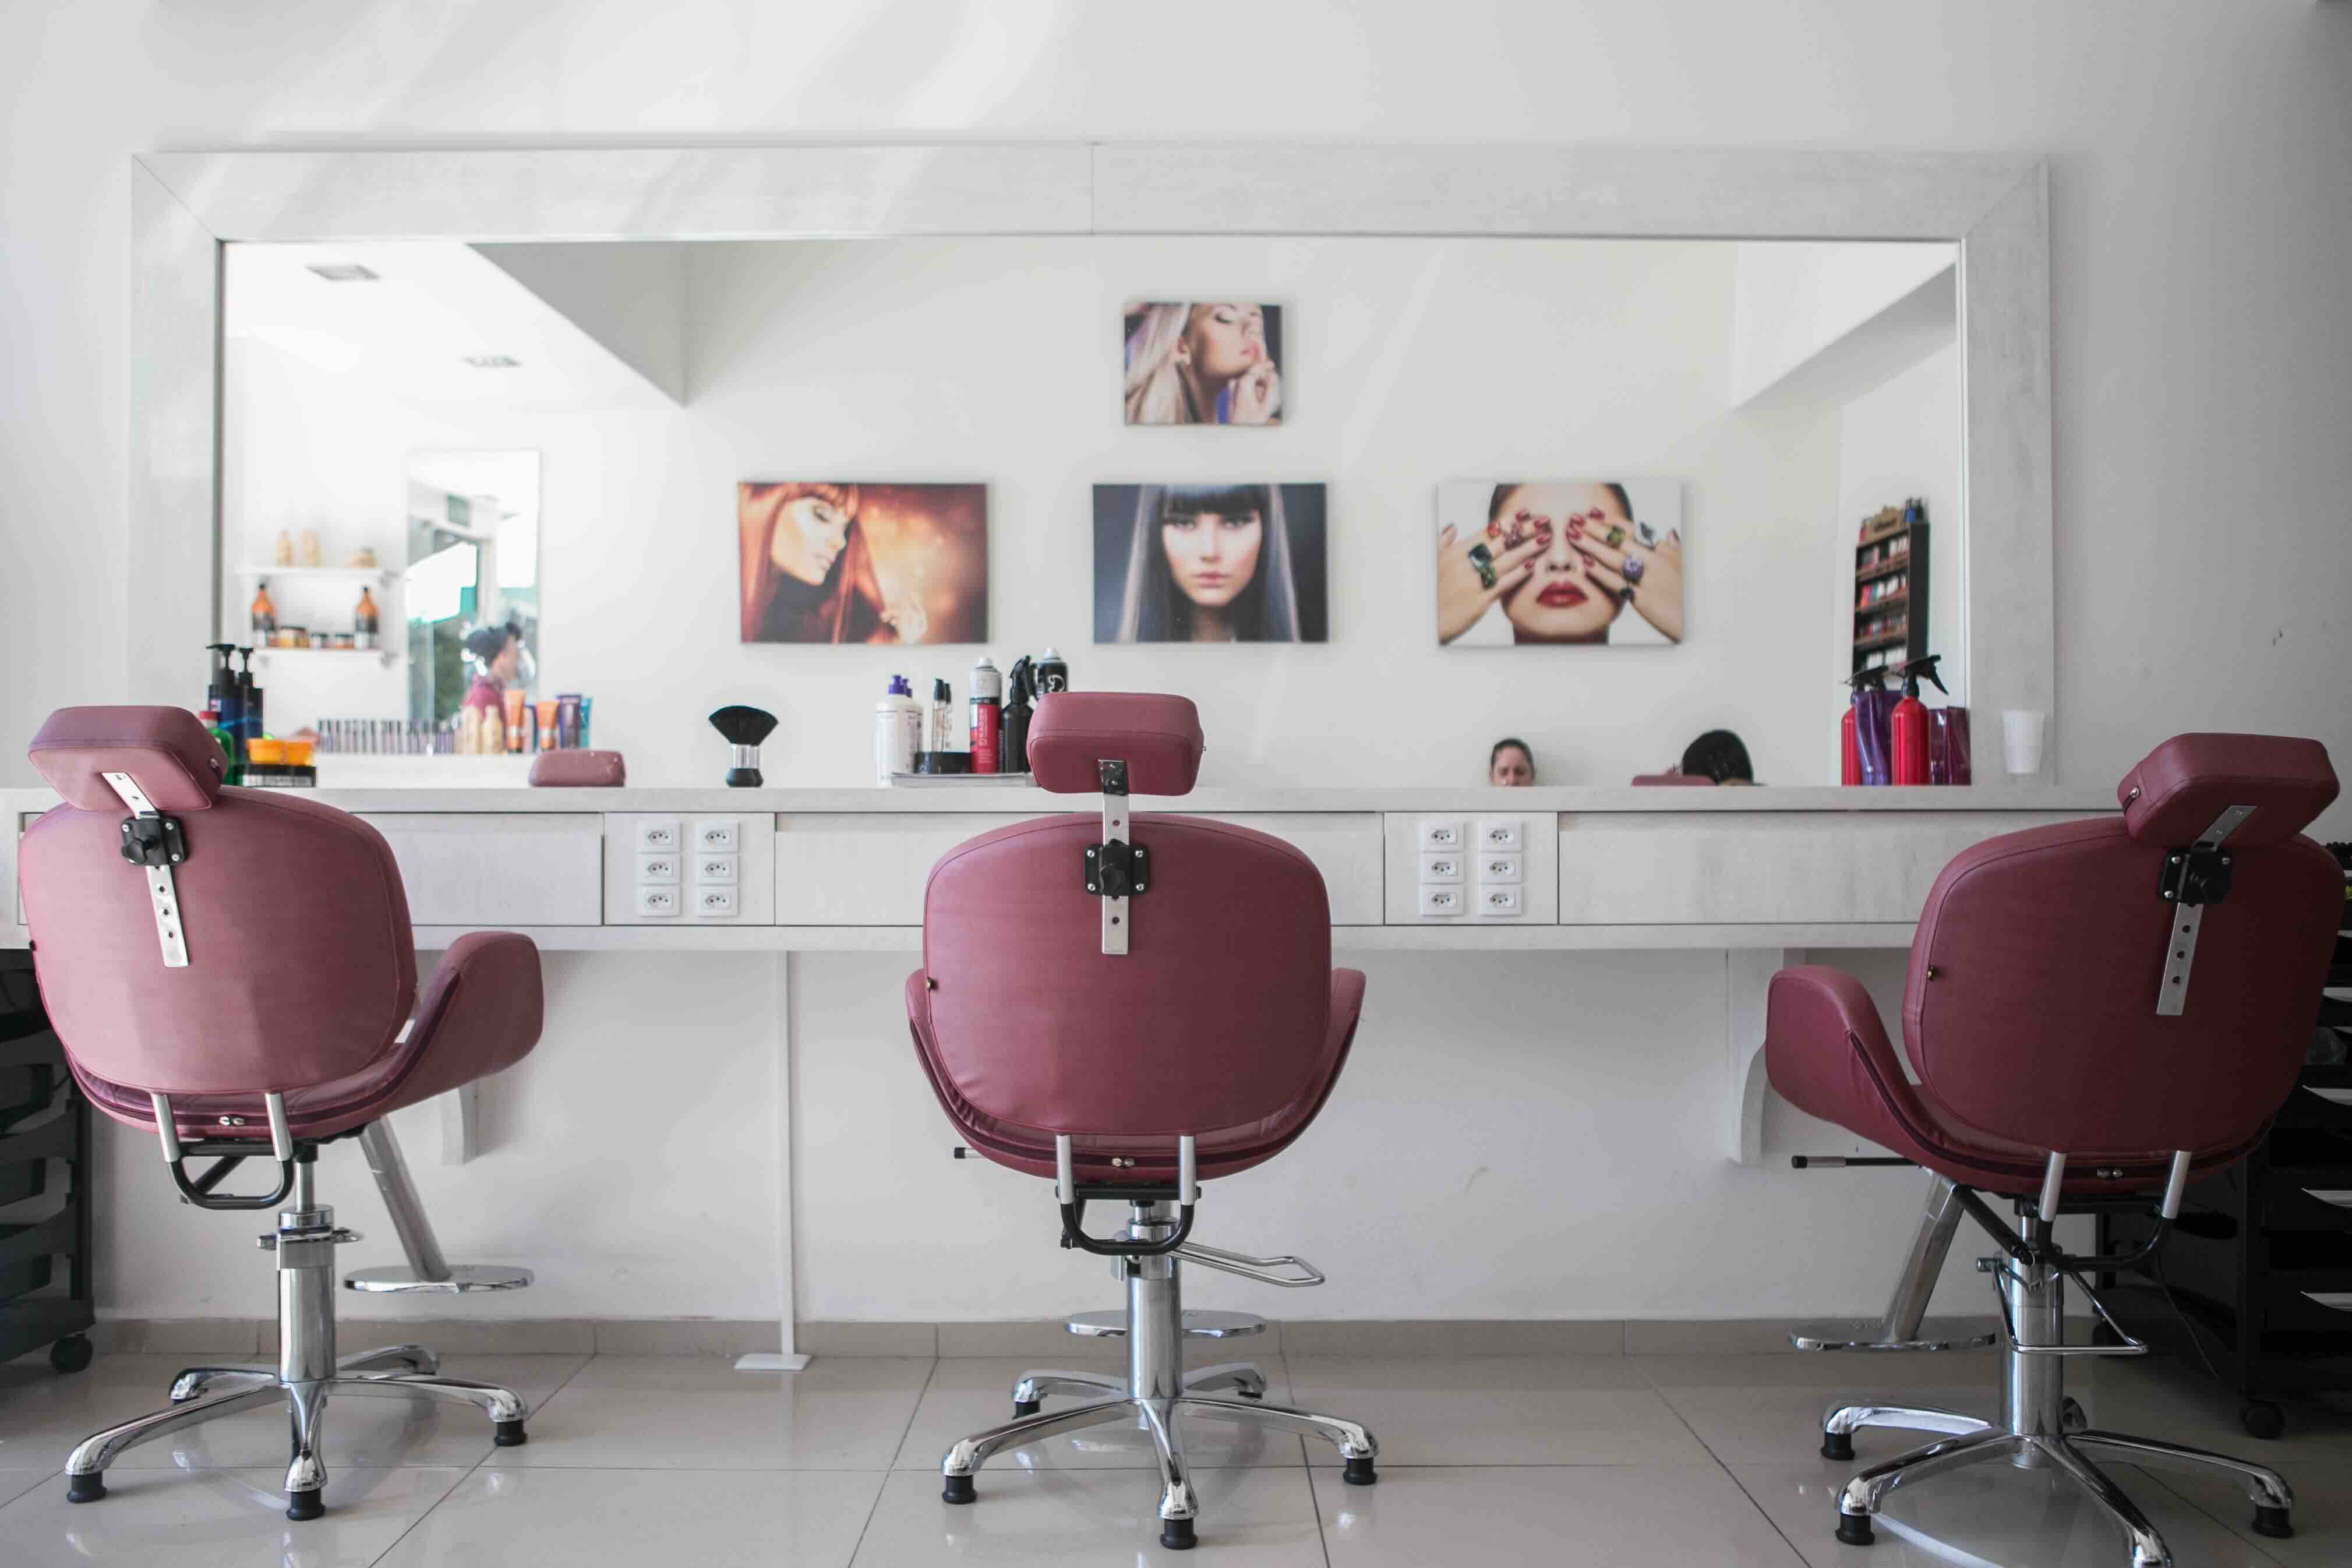 DATAGEST-service-accueil-telephonique-telesecretariat-normandie-salons-de-coiffure